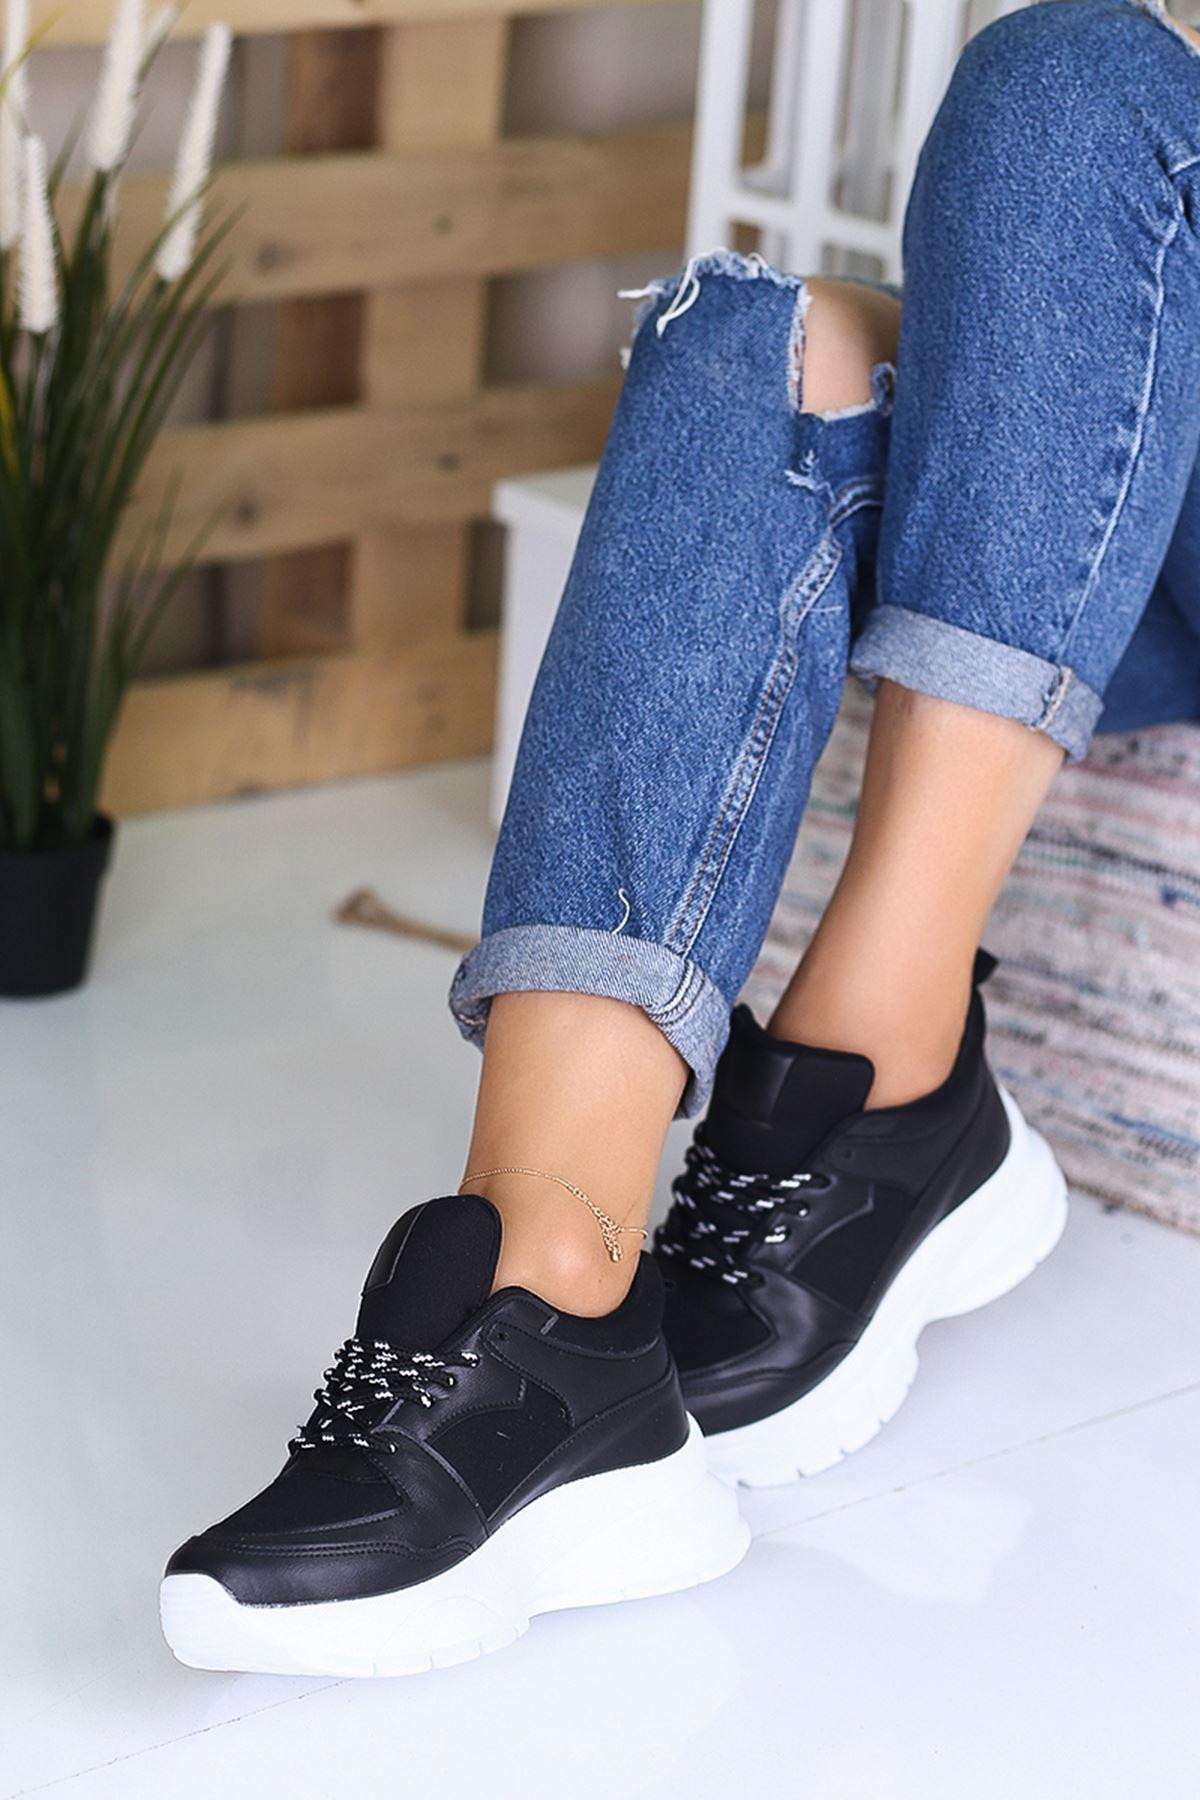 Lezan Ortapedik Siyah Bayan Spor Ayakkabı